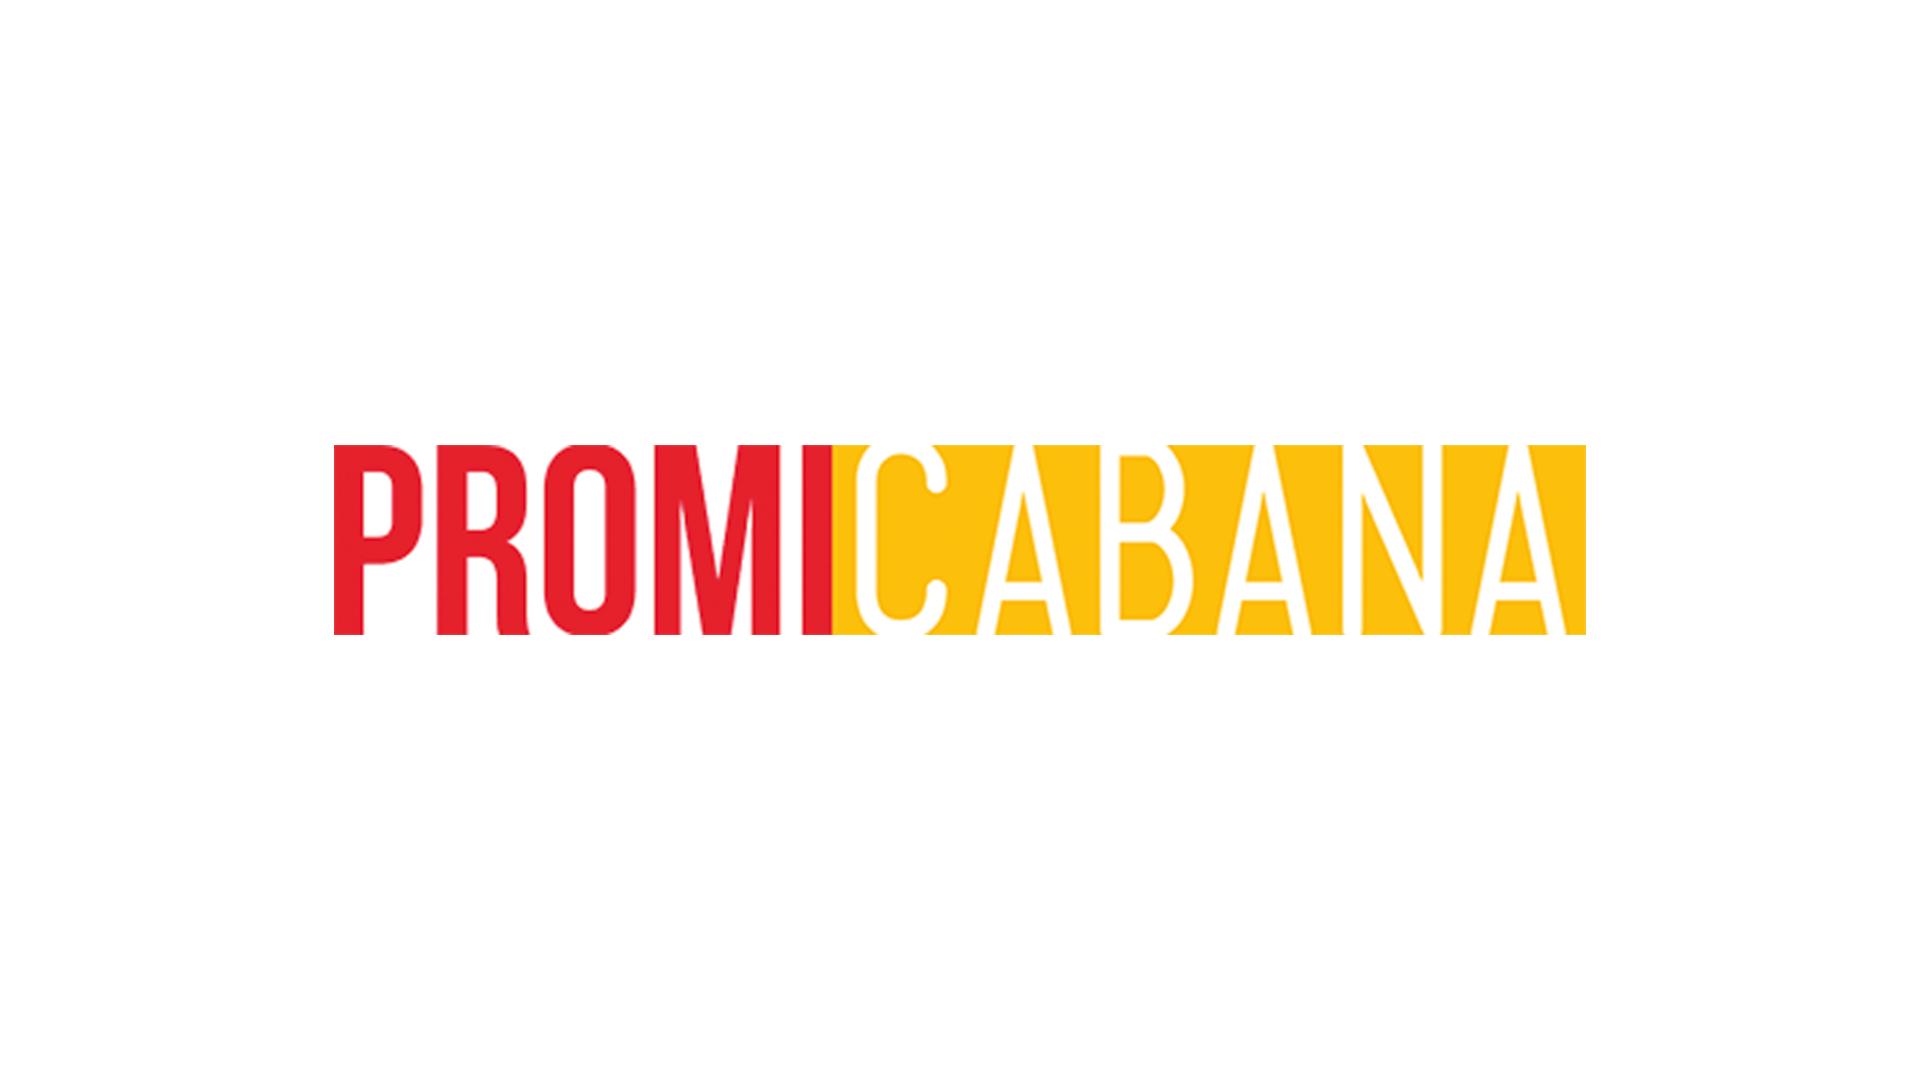 Charlie-Sheen-Emmys-2011